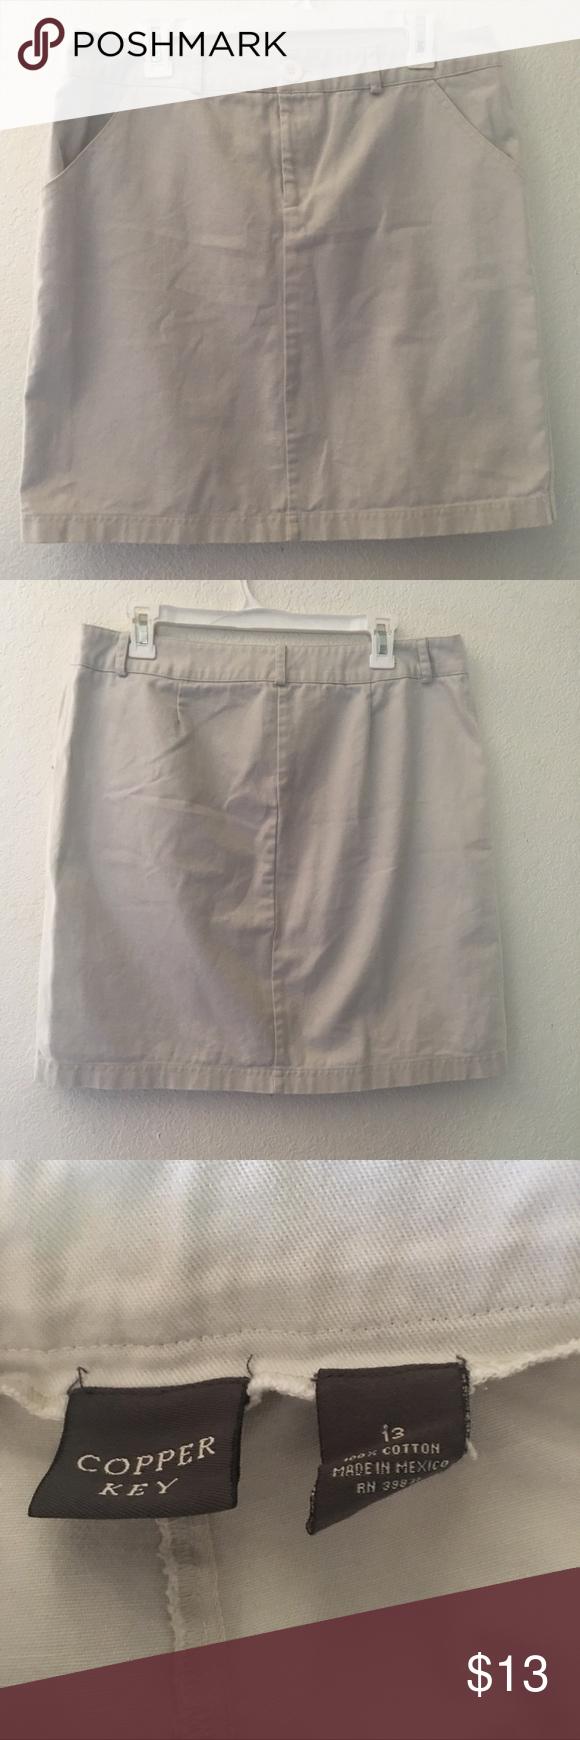 df2f2351c5 Juniors Jean just thinking of you.🔥🔥 Copper Key jean skirt size 13 Copper  Key Skirts Midi